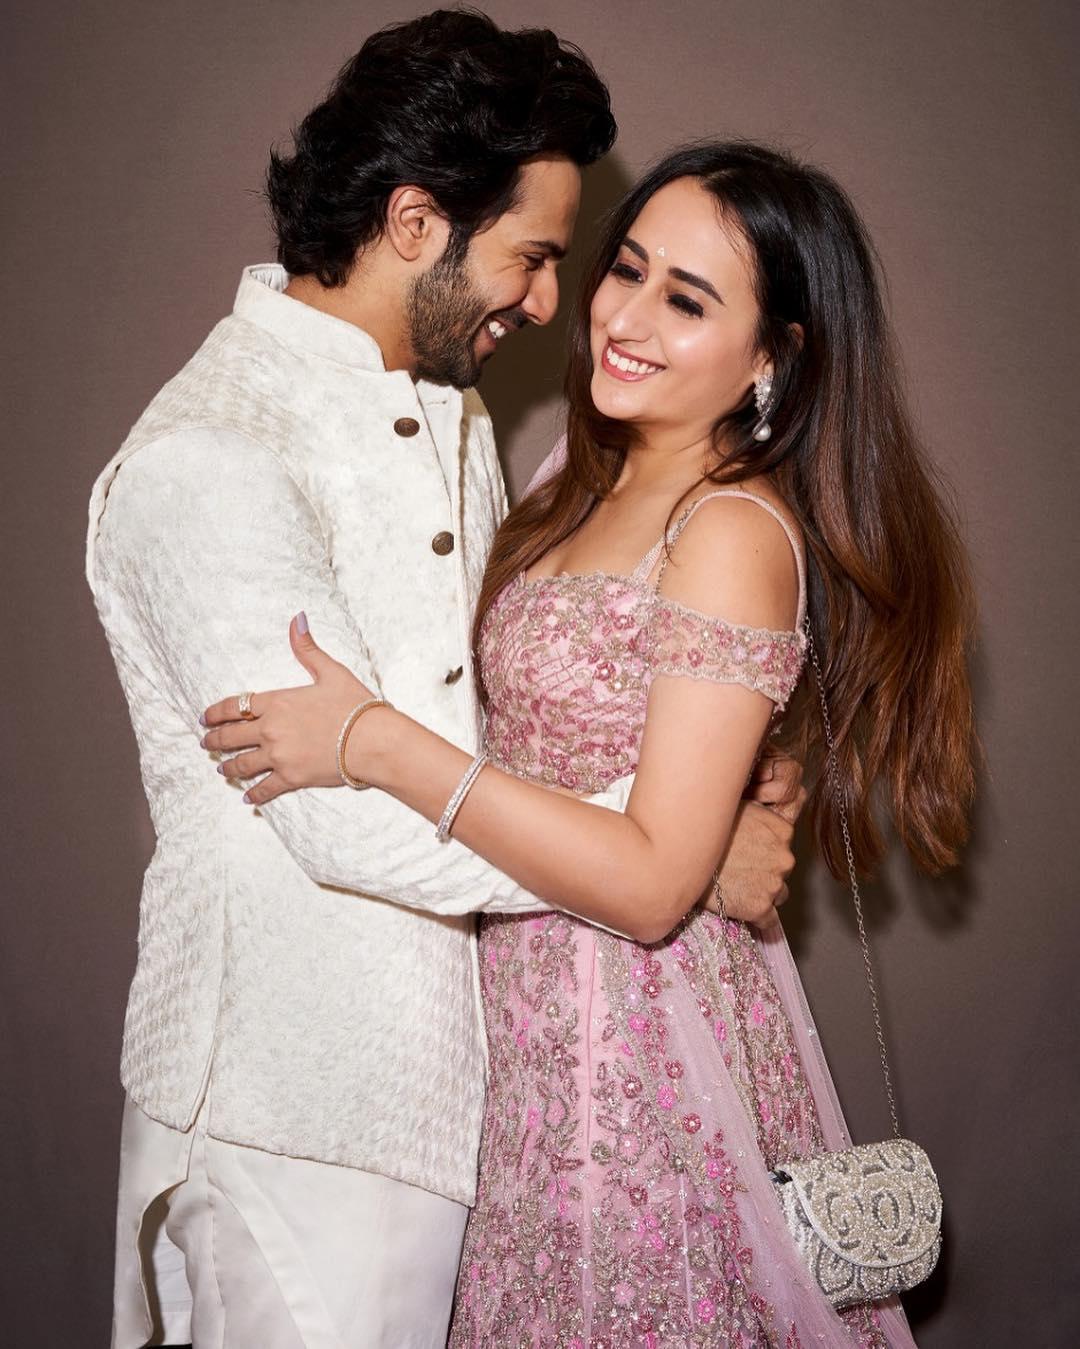 Varun Dhawan with girlfriend at Isha Ambani's wedding